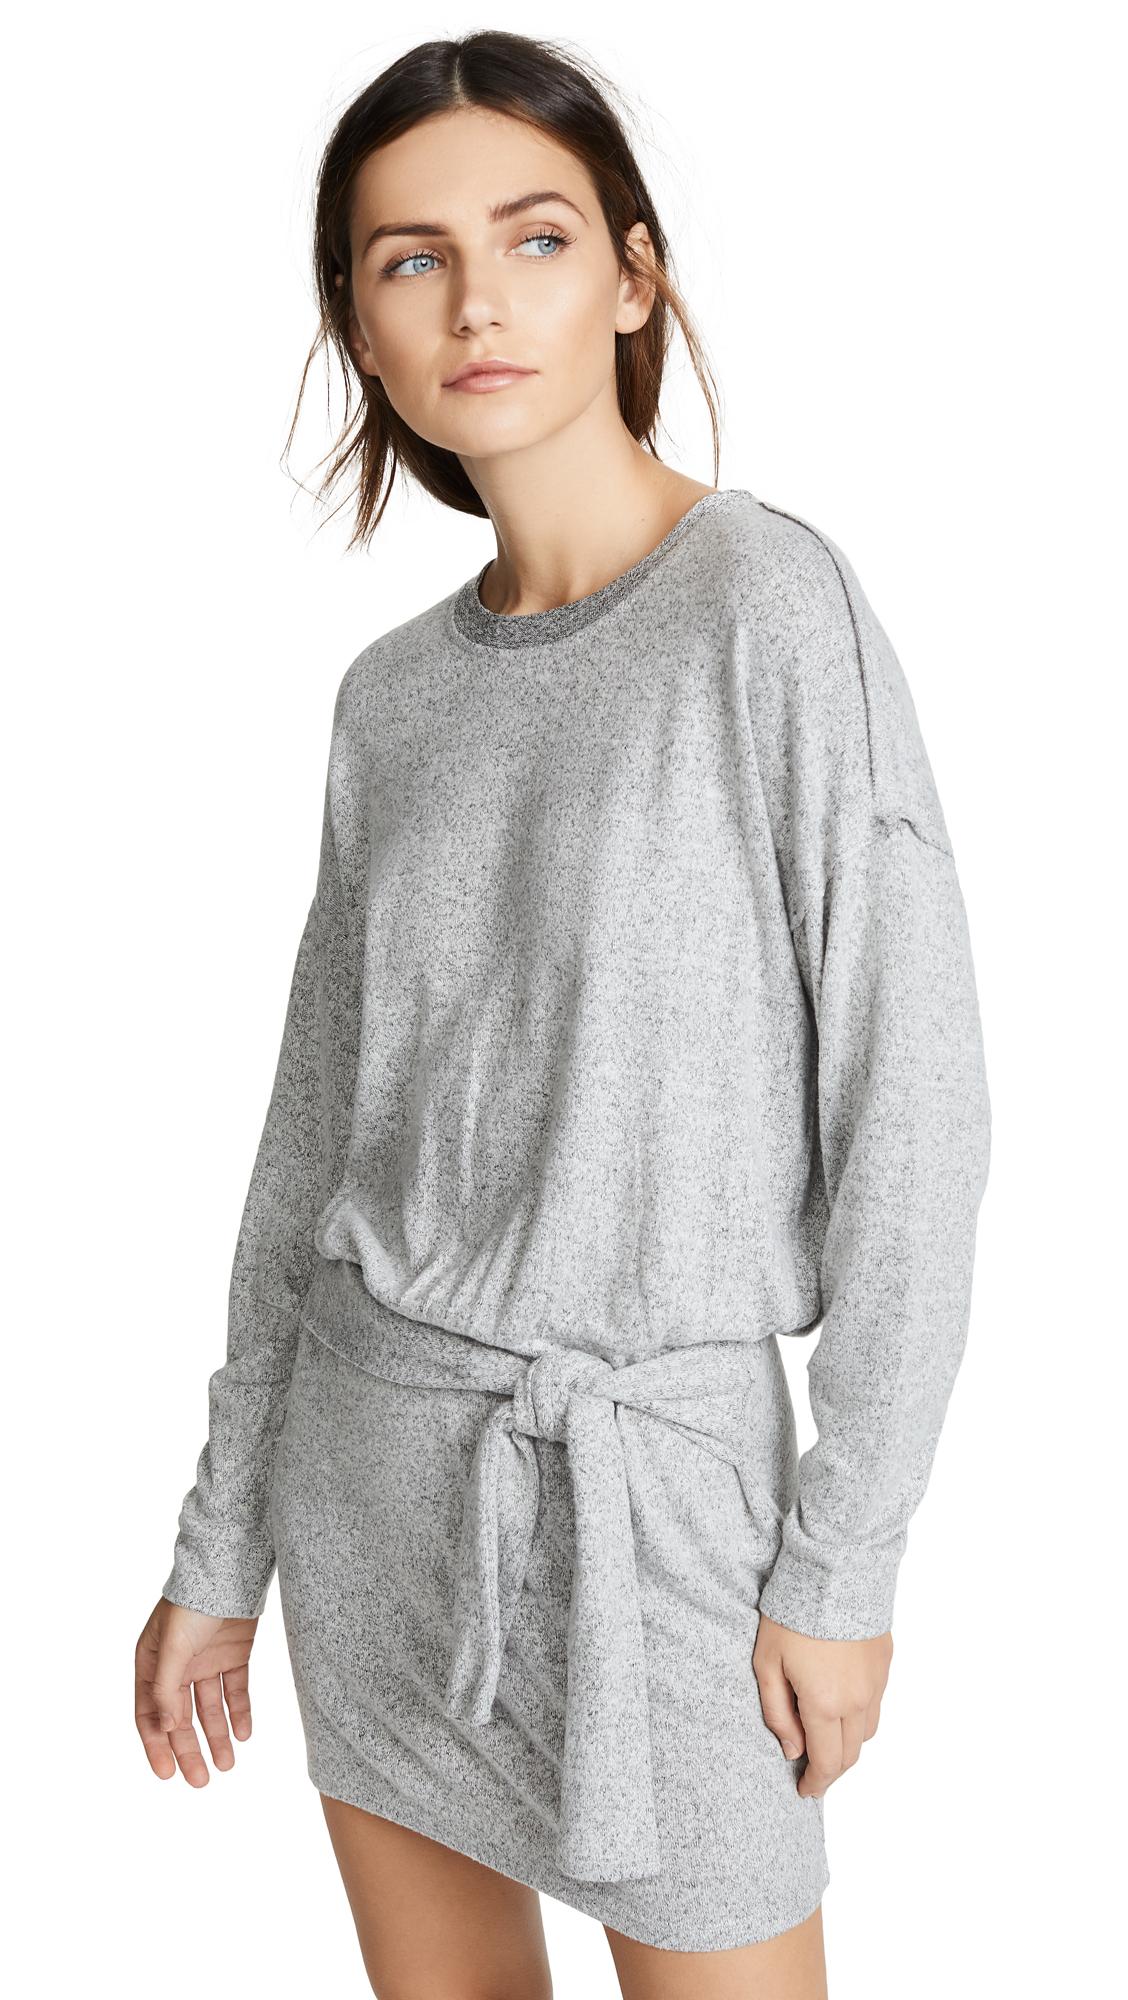 Splendid Addison Jersey Dress - Heather Grey